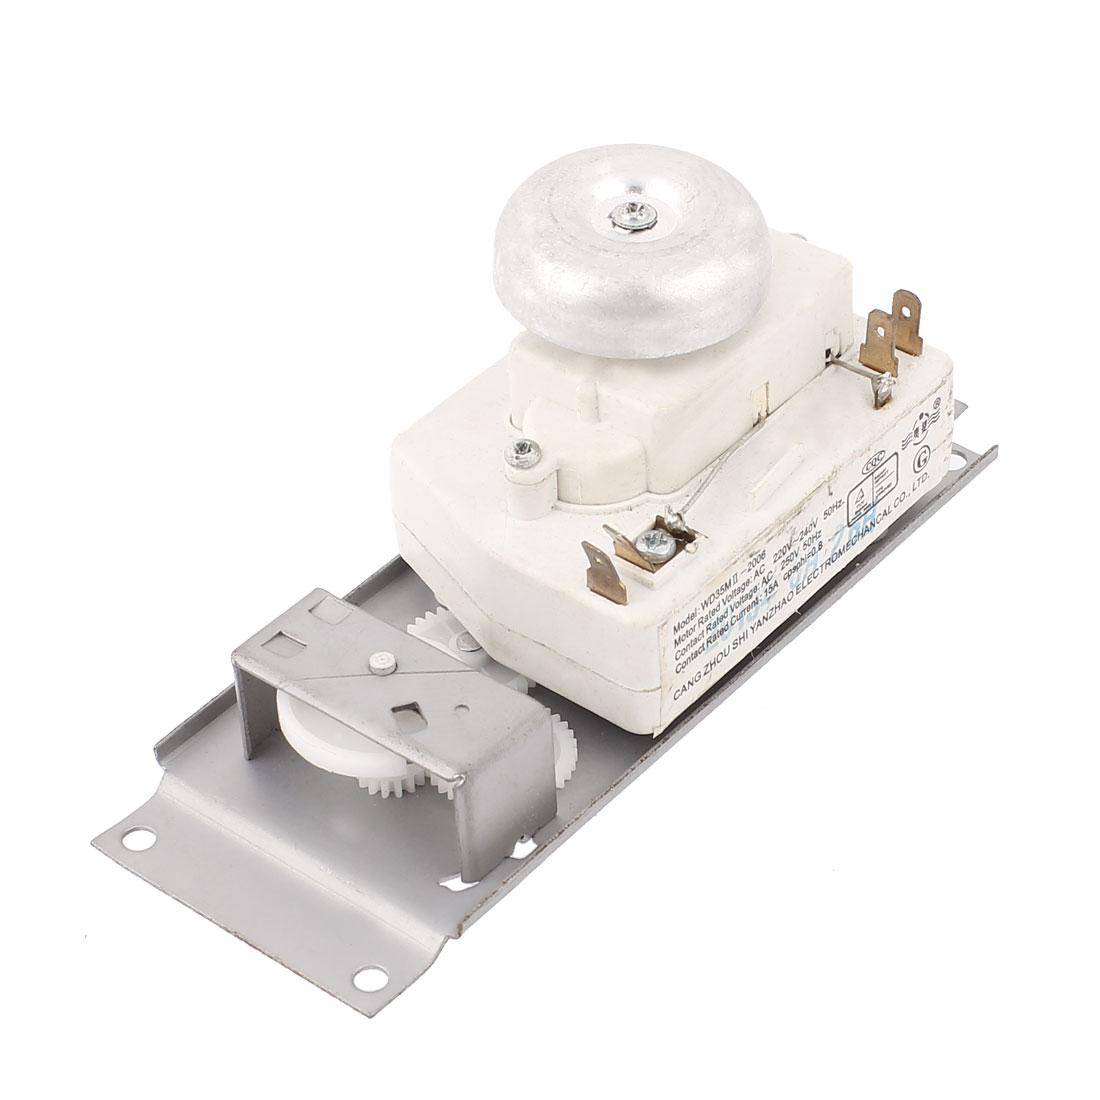 AC 220V-240V 50Hz 30 Minutes Timer Control Controller for Midea Microwave Oven